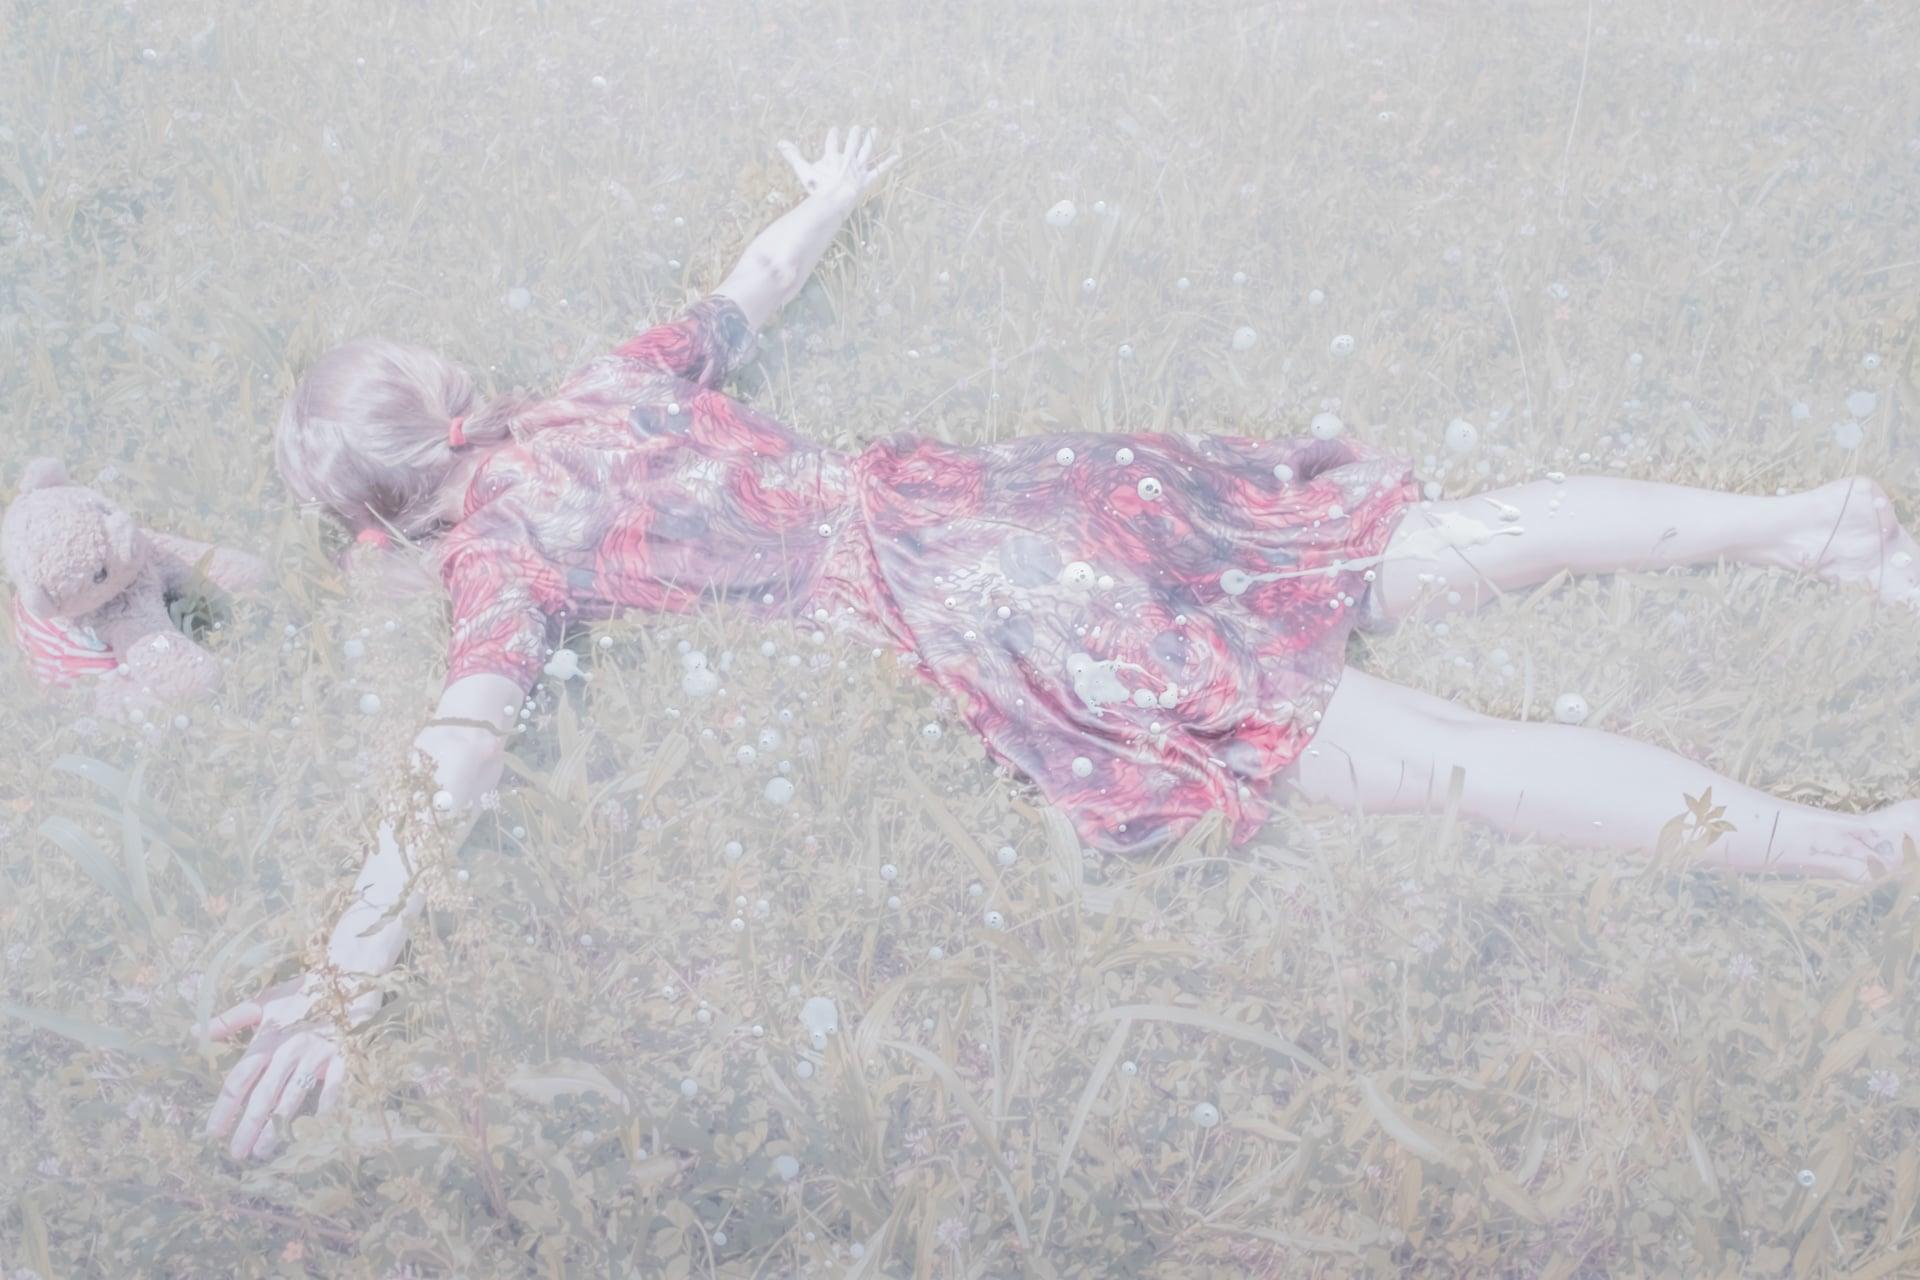 Fog-and-memories-4